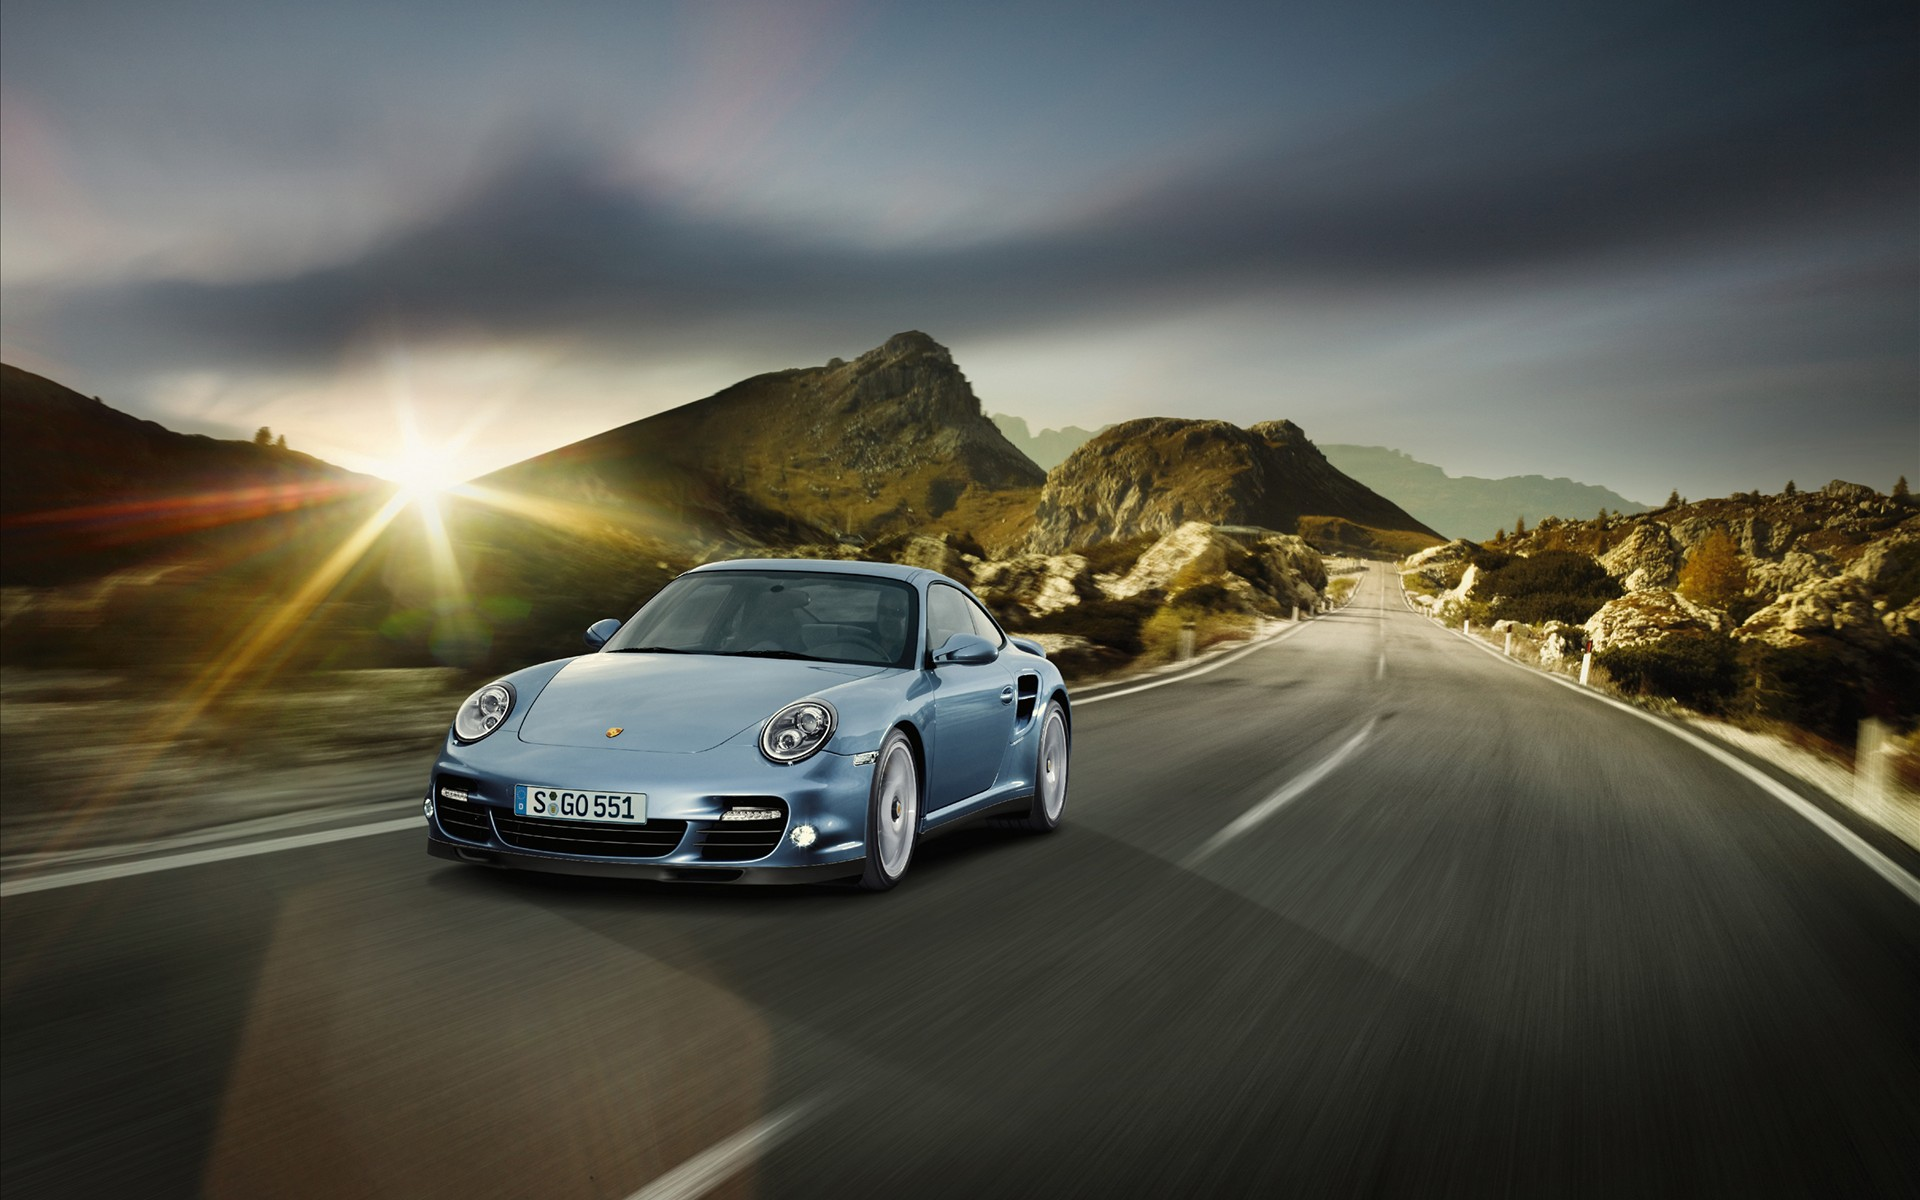 2011 Porsche 911 Turbo S Wallpaper HD Car Wallpapers 1920x1200